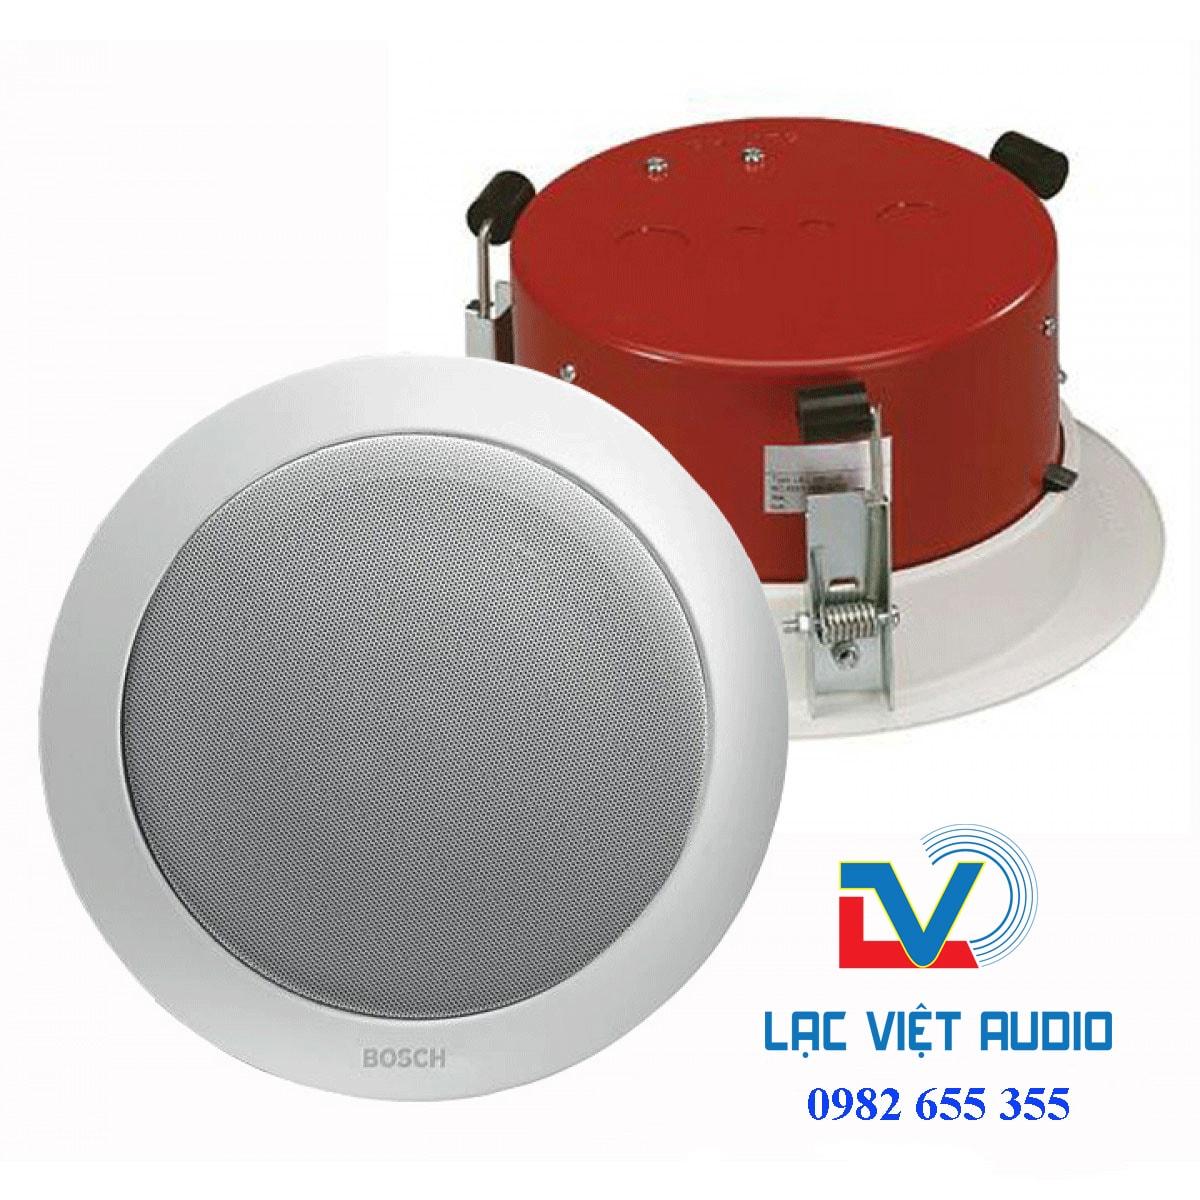 Ứng dụng Loa Bosch LBC 309001